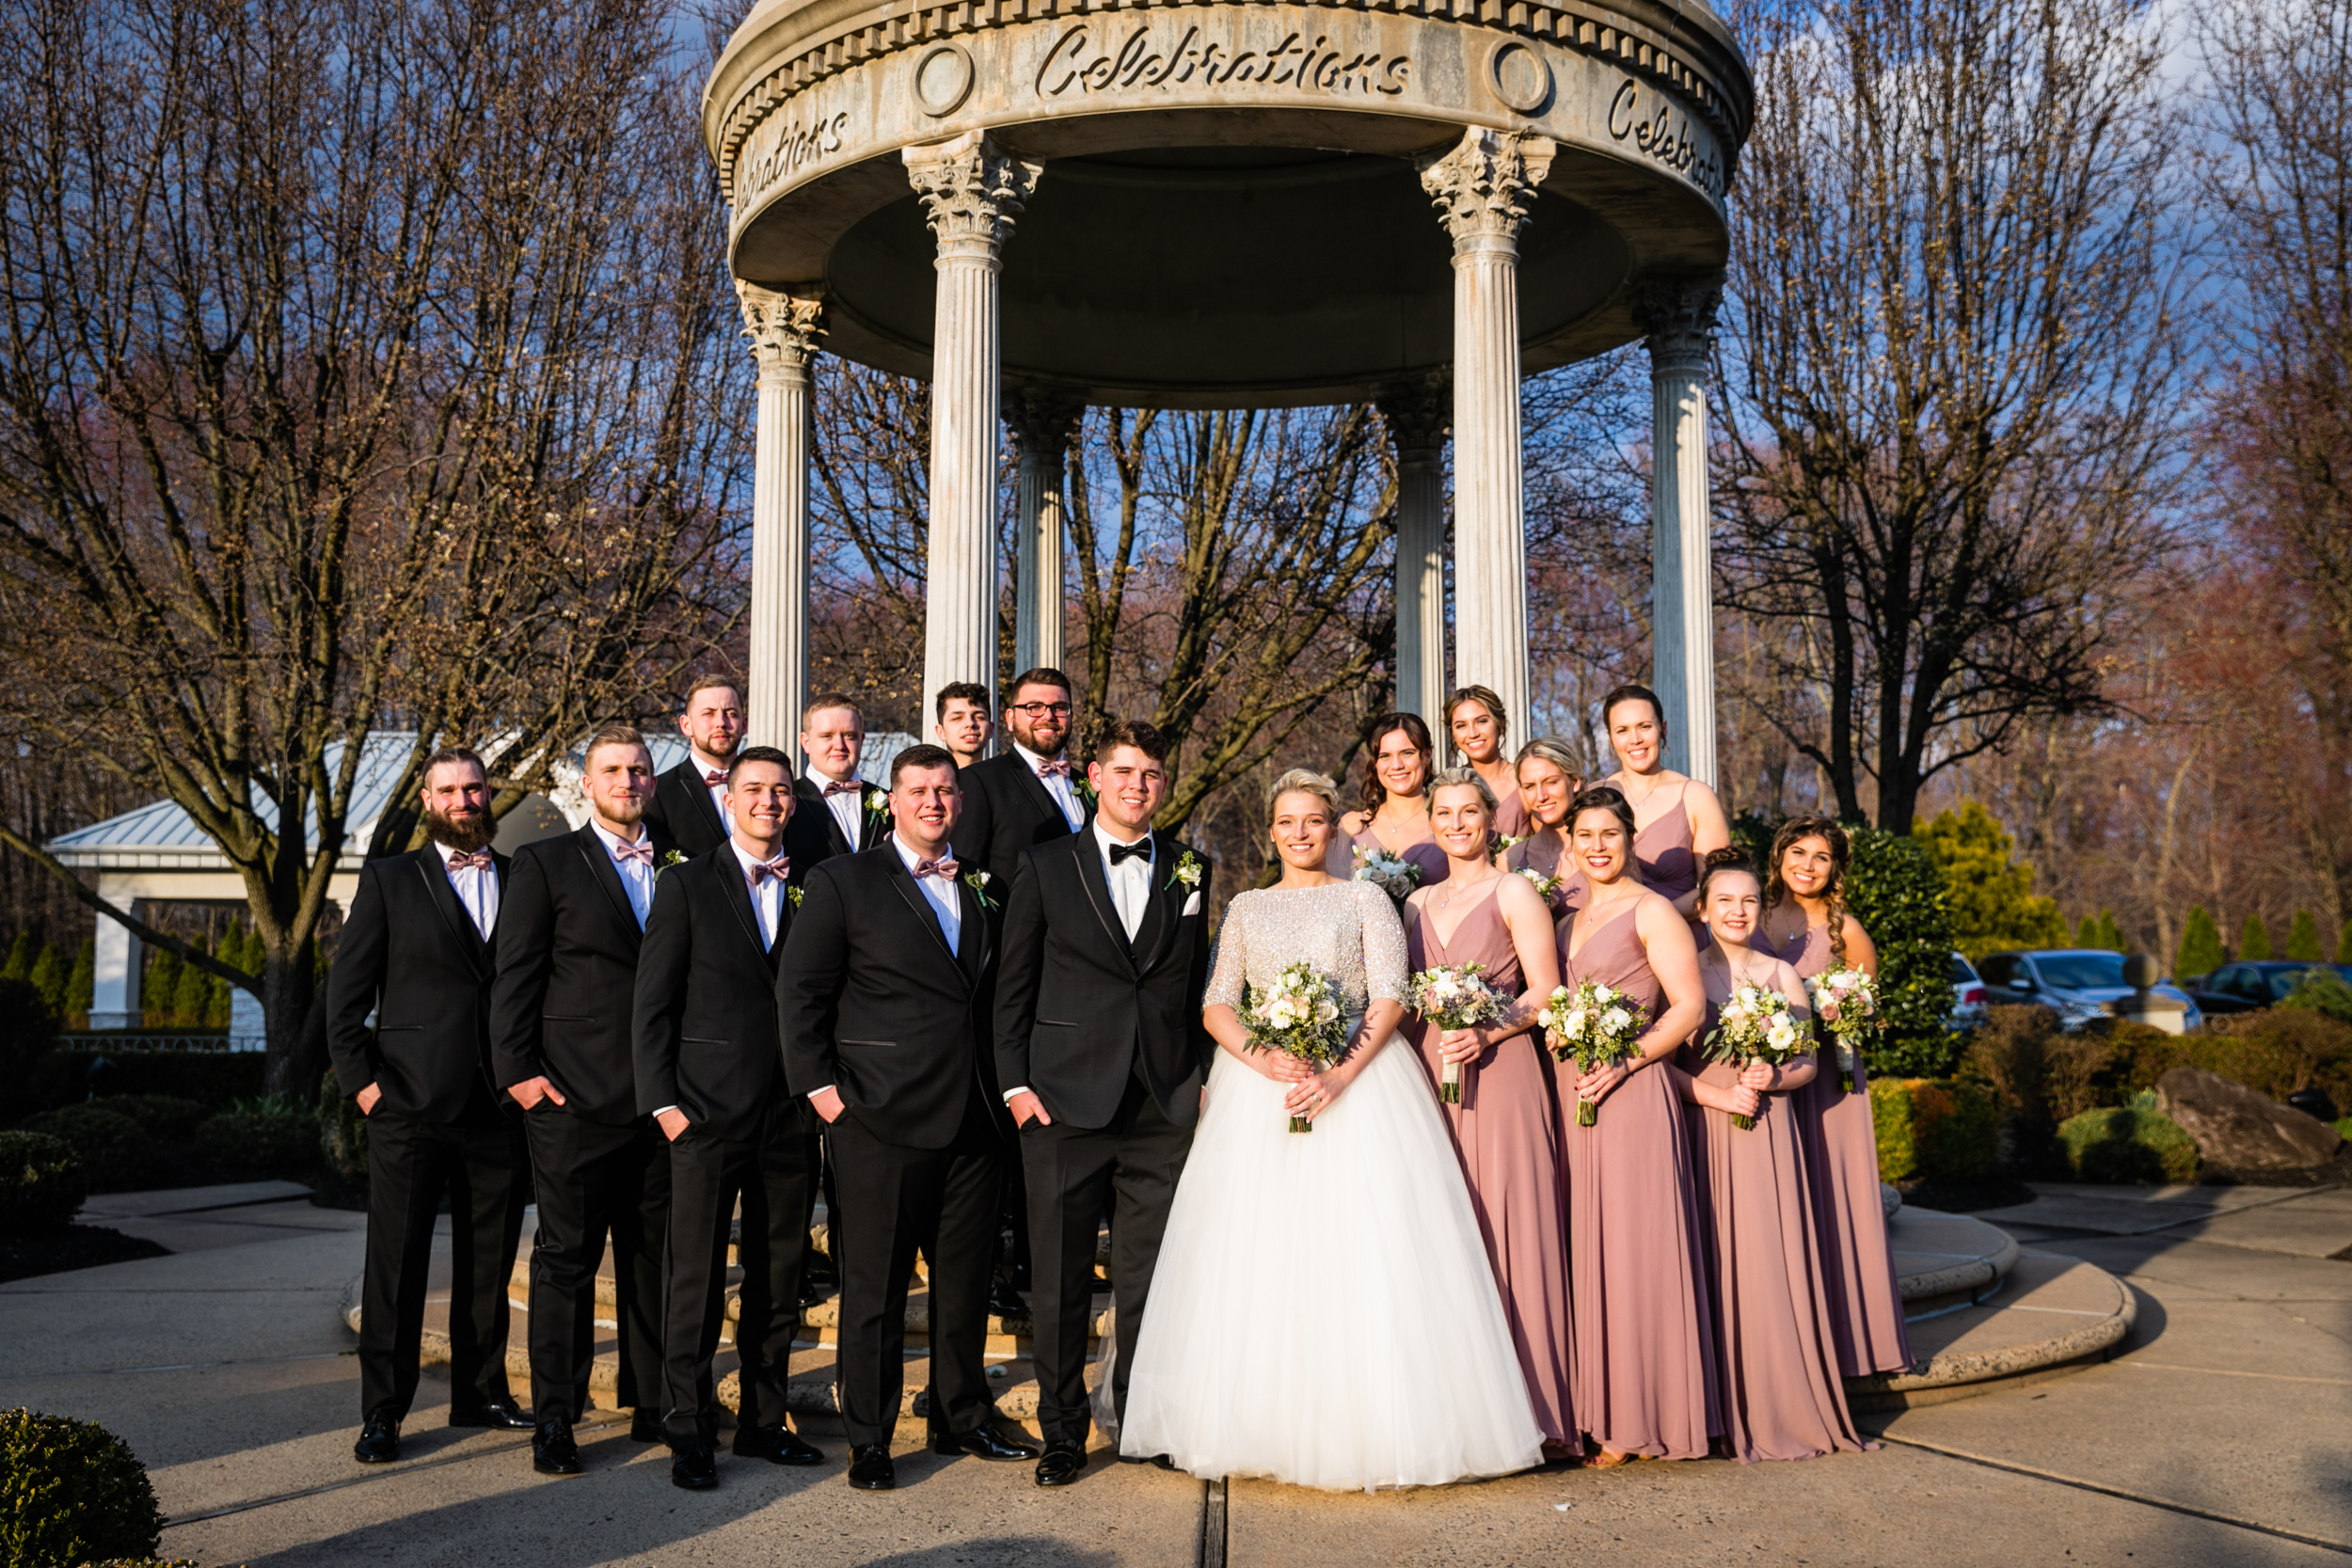 CELEBRATIONS BENSALEM WEDDING PHOTOGRAPHY-57.jpg